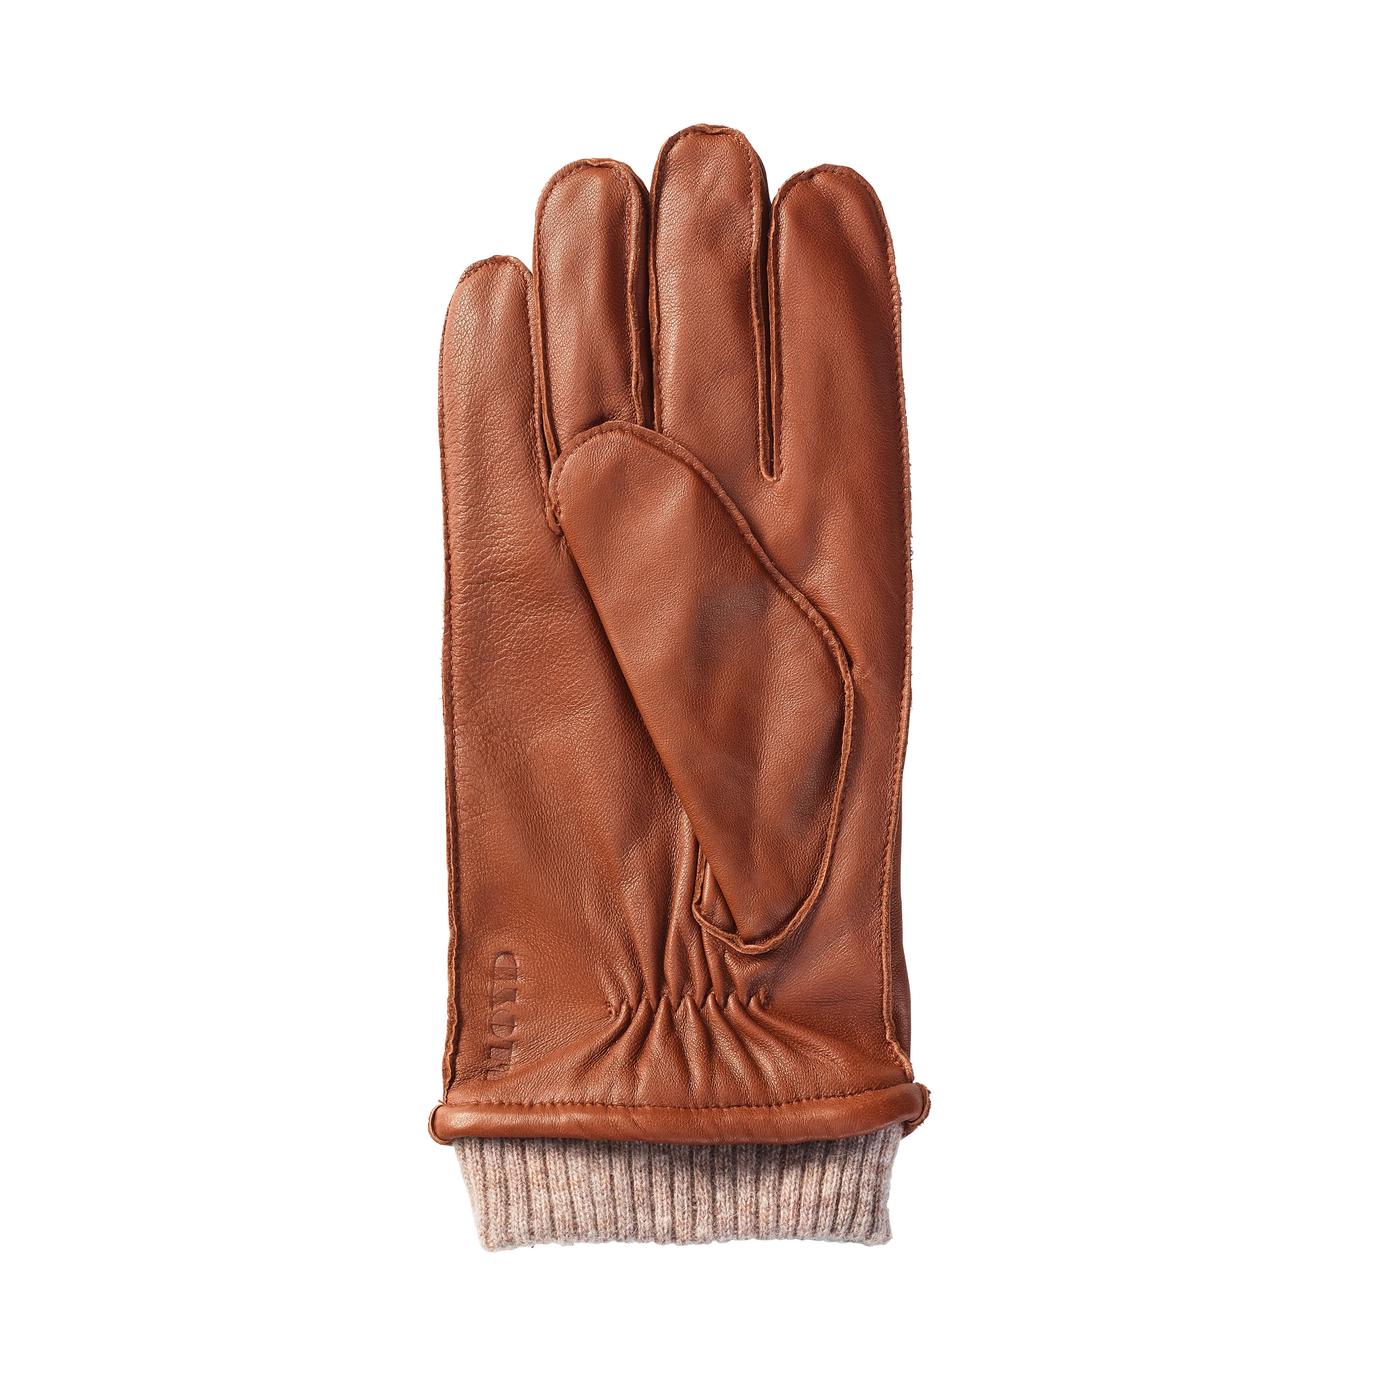 Handschuhe | Accessoires > Handschuhe > Sonstige Handschuhe | Lloyd